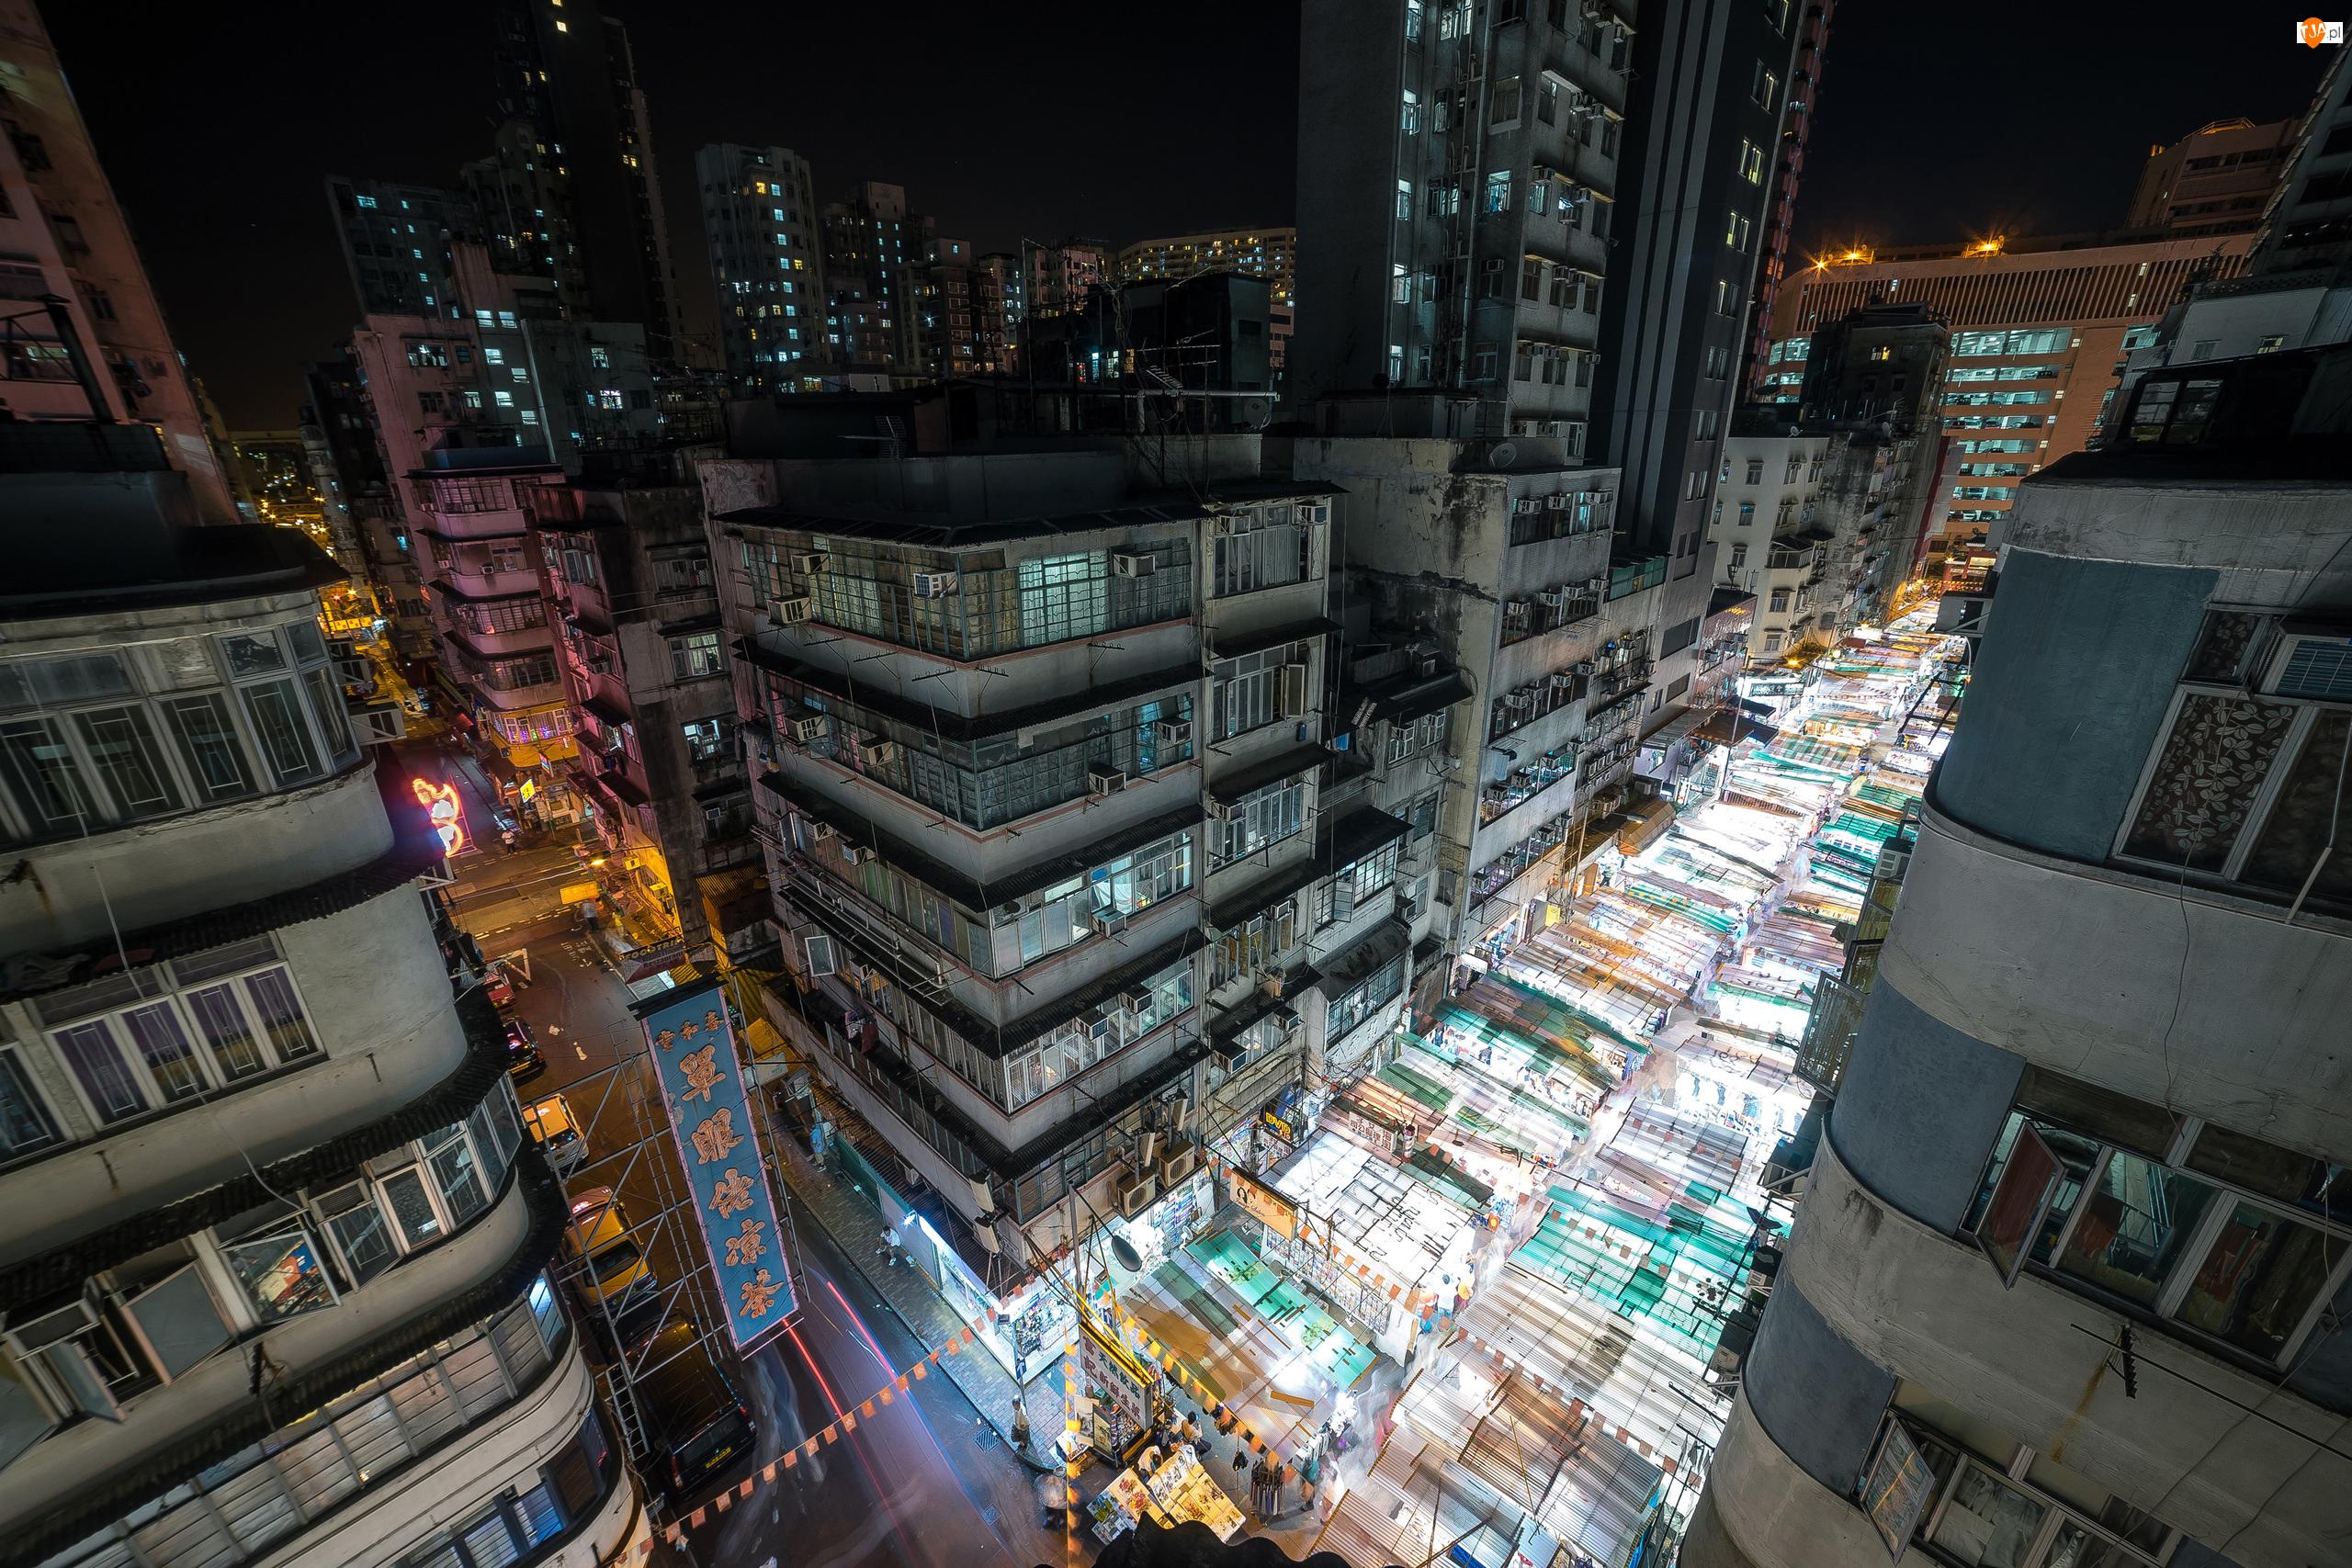 Noc, Domy, Hongkong, Chiny, Ulice